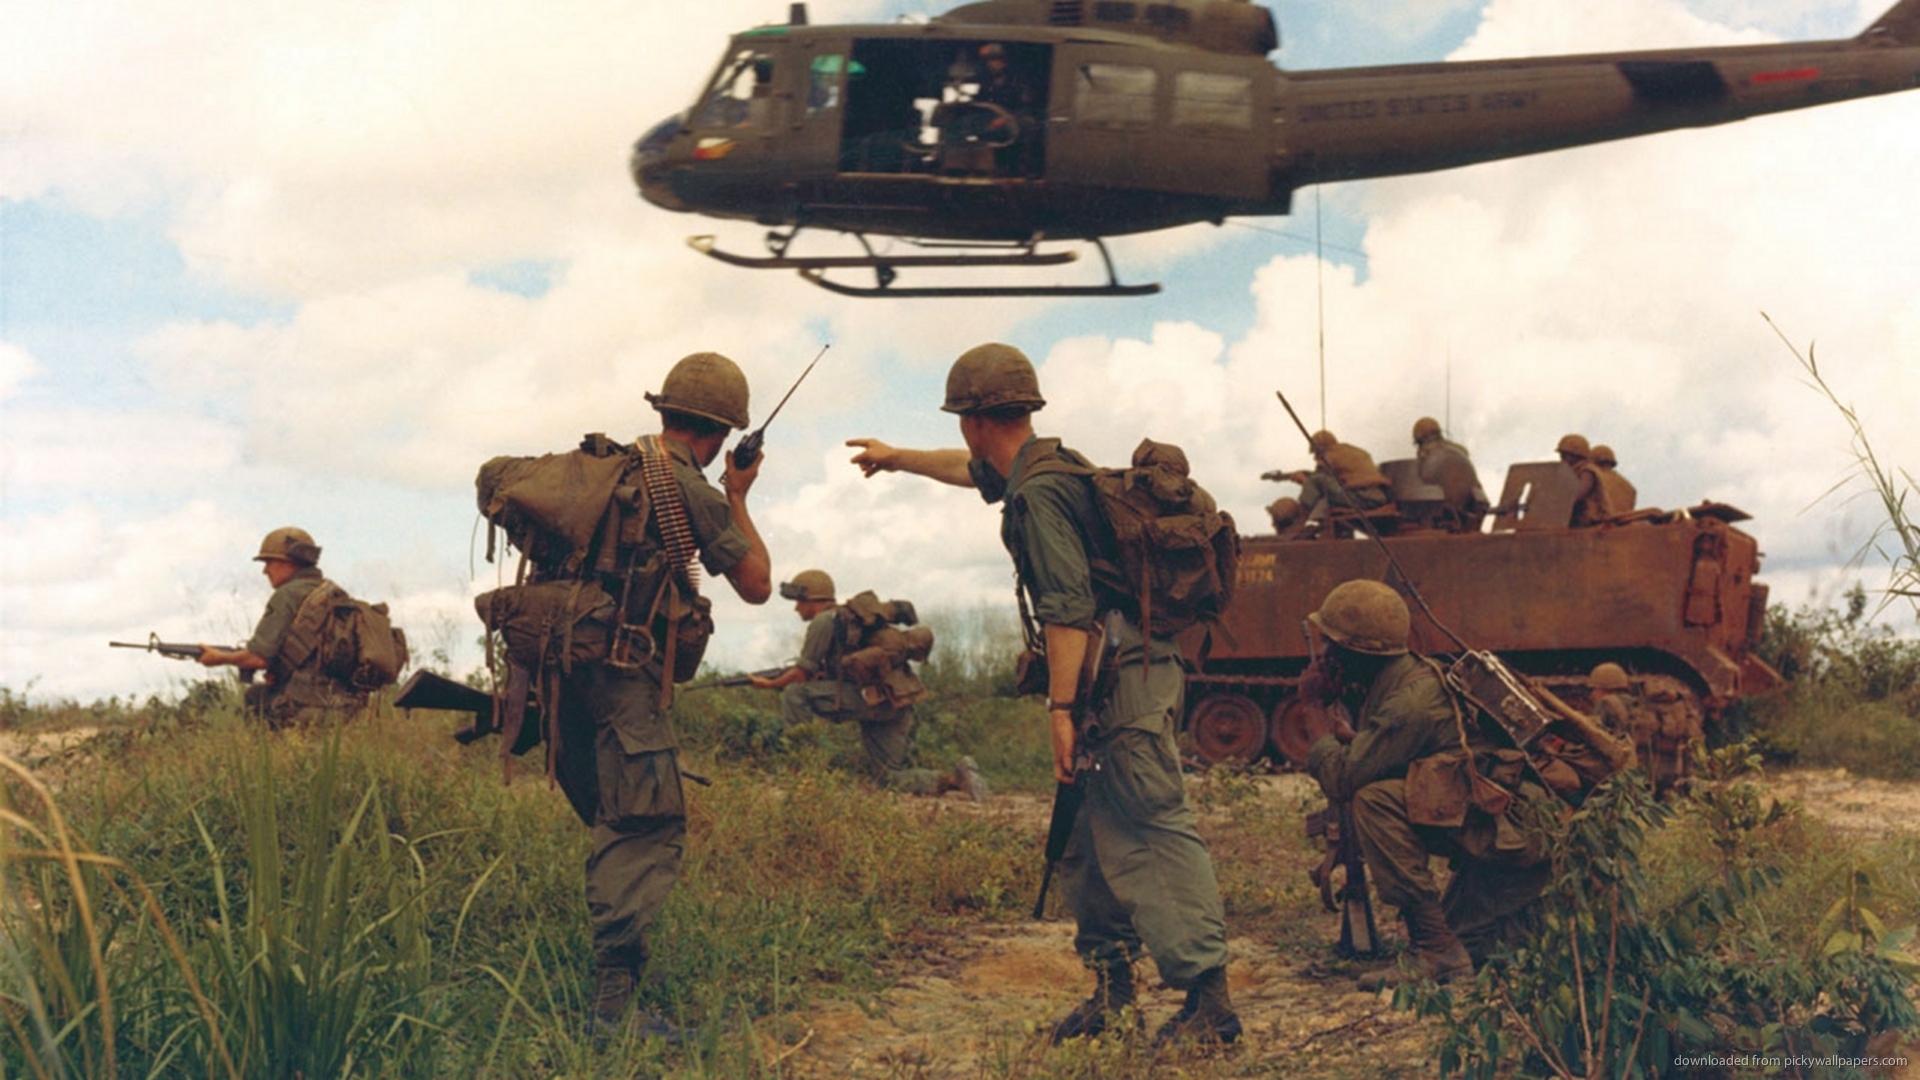 Vietnam War Wallpapers Full HD 86S53W7   4USkY 1920x1080